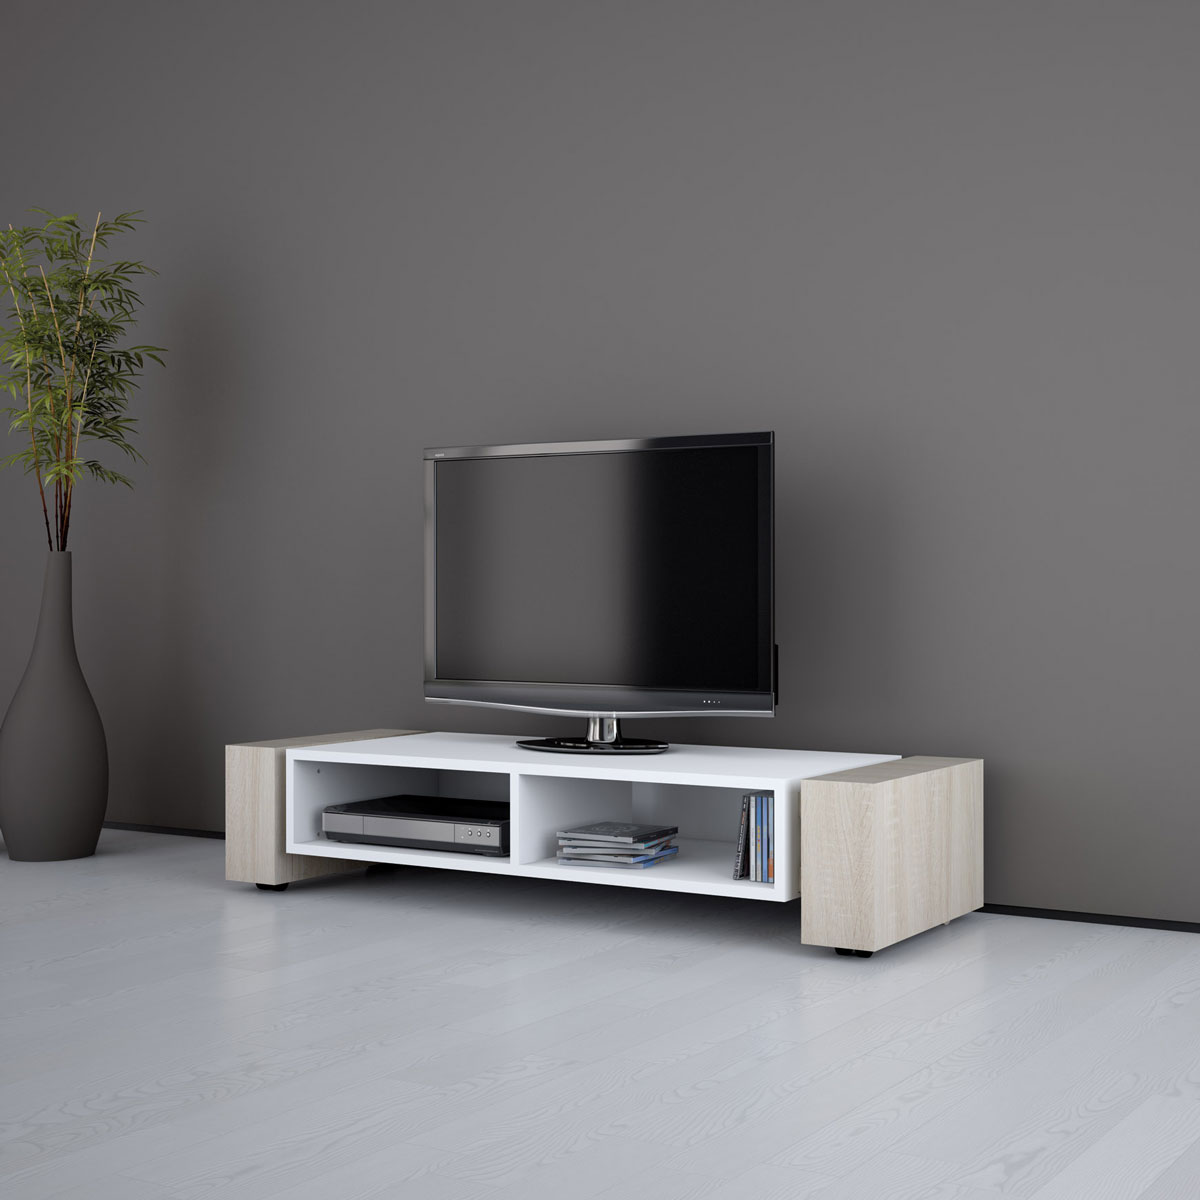 flatscreenhalterung archive tv m bel und hifi m bel guide. Black Bedroom Furniture Sets. Home Design Ideas